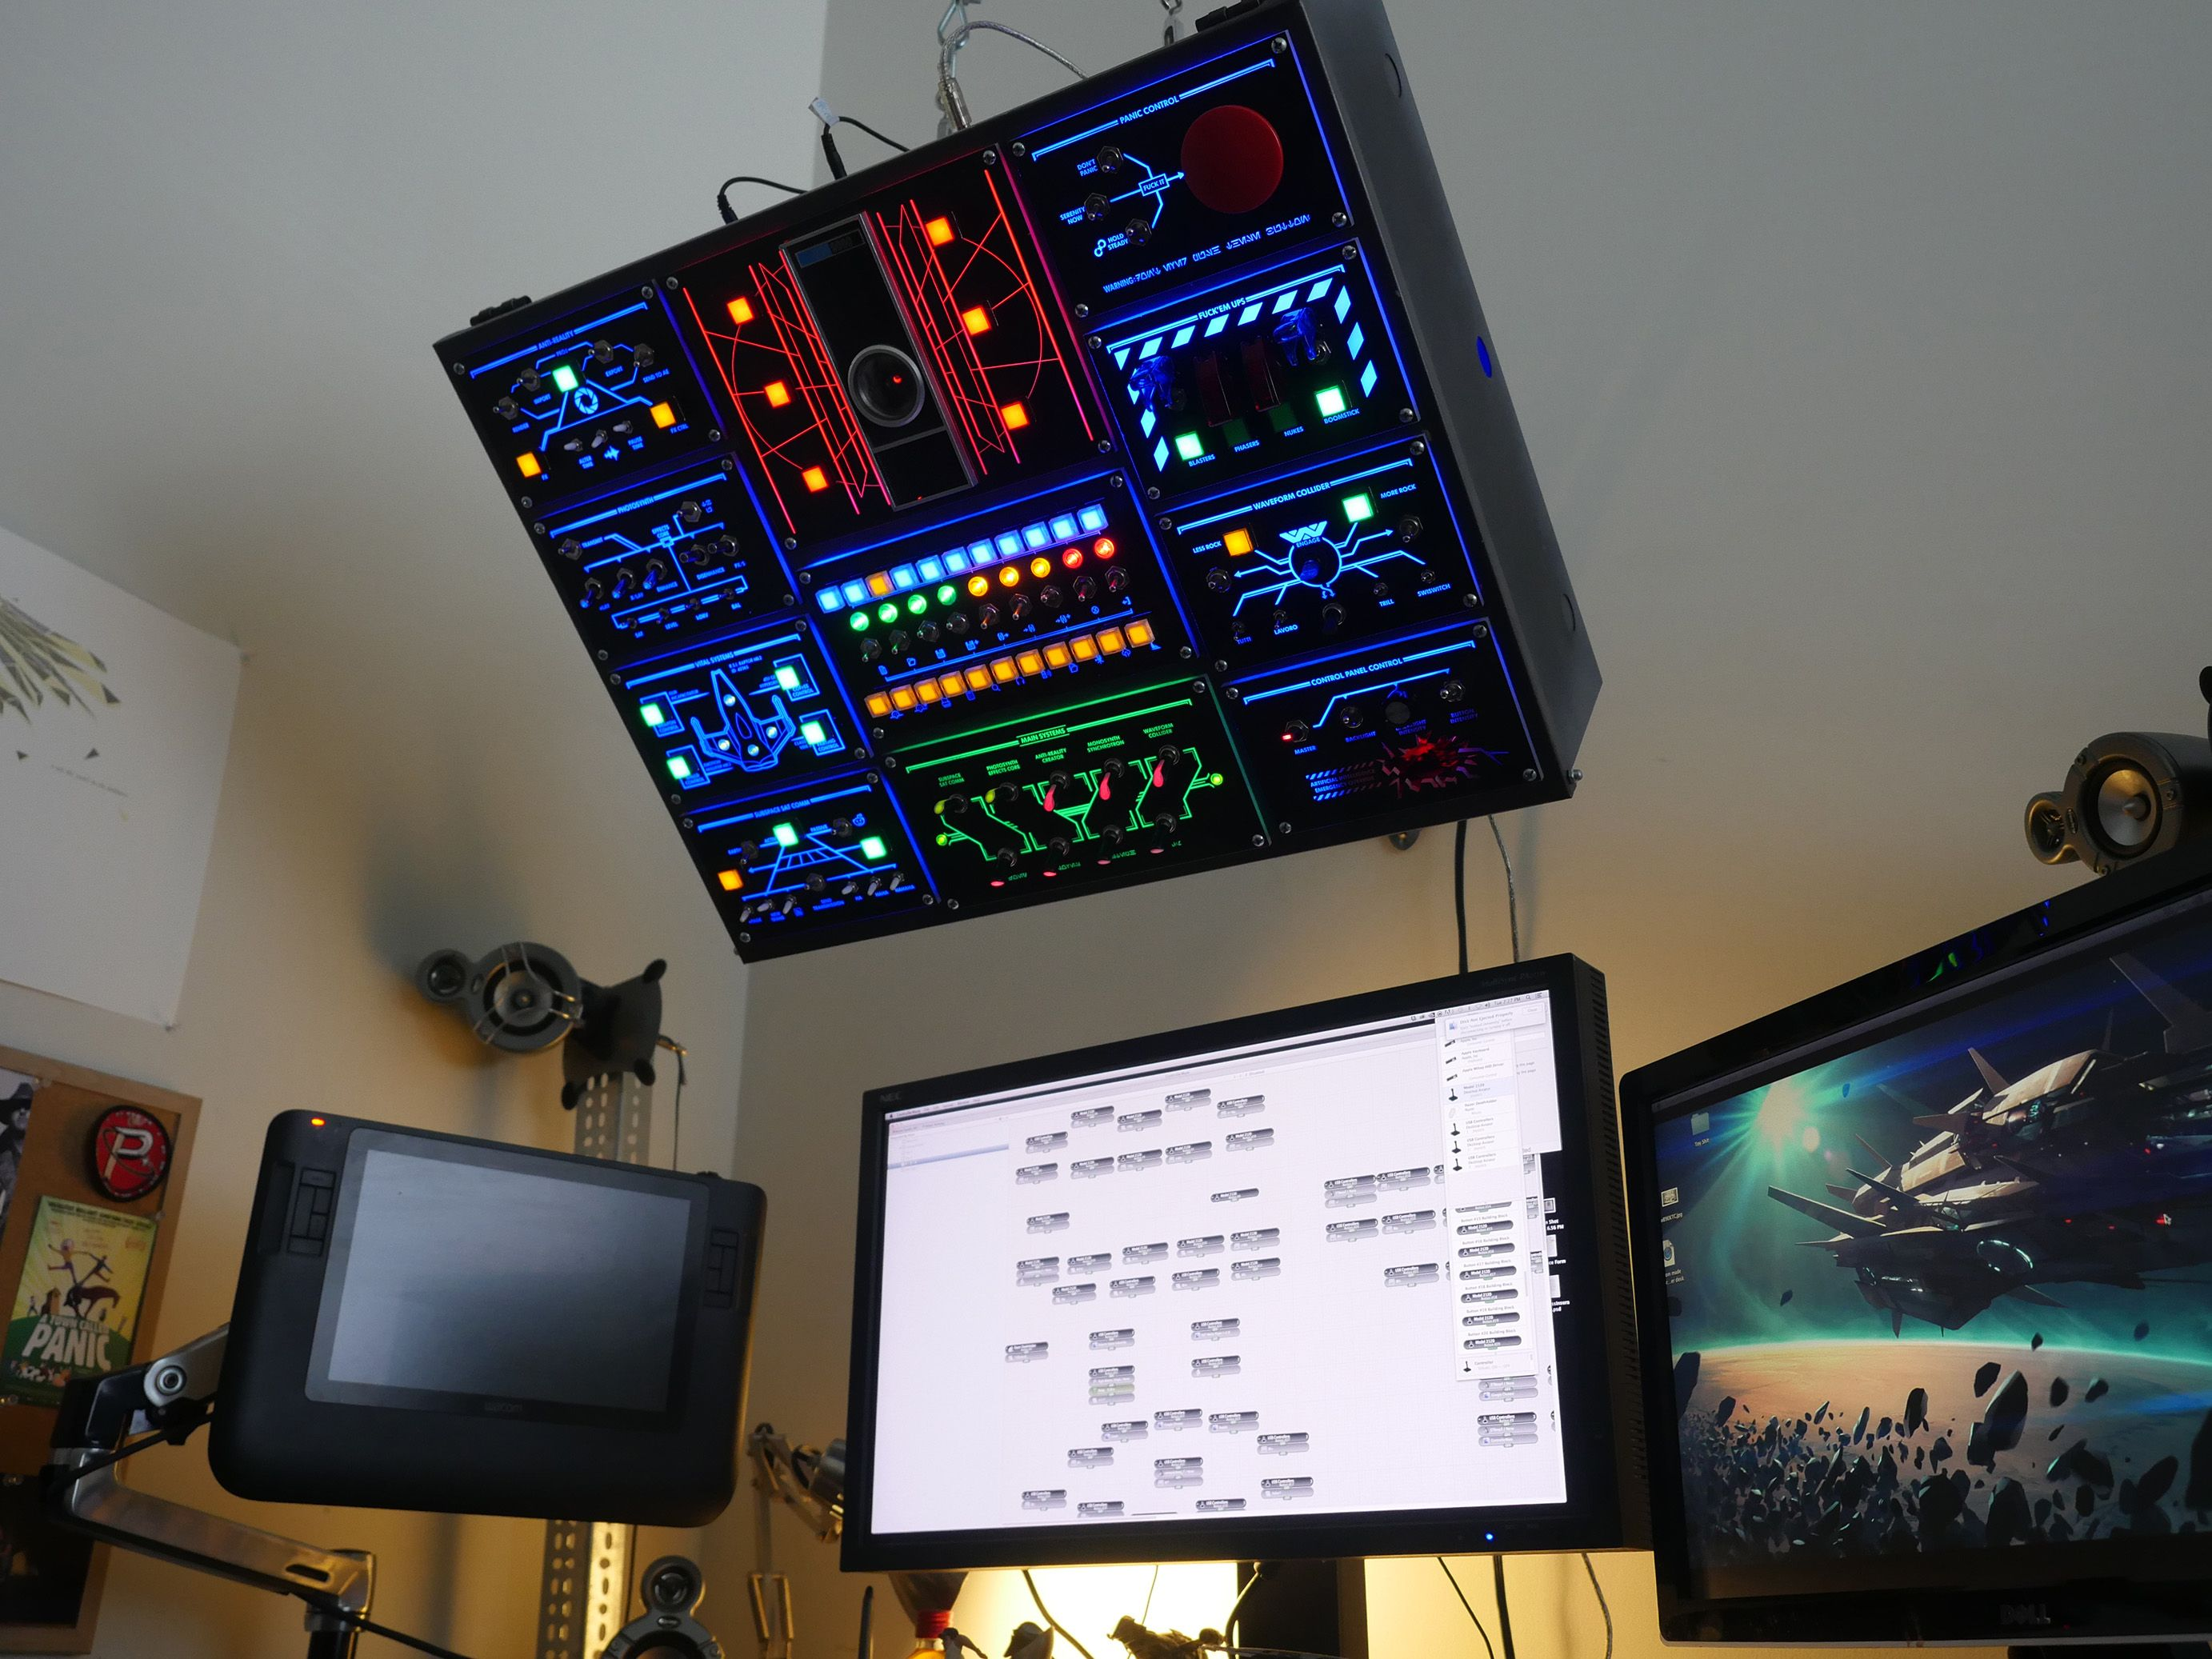 Diy Overhead Control Panel Computer Projectselectronics